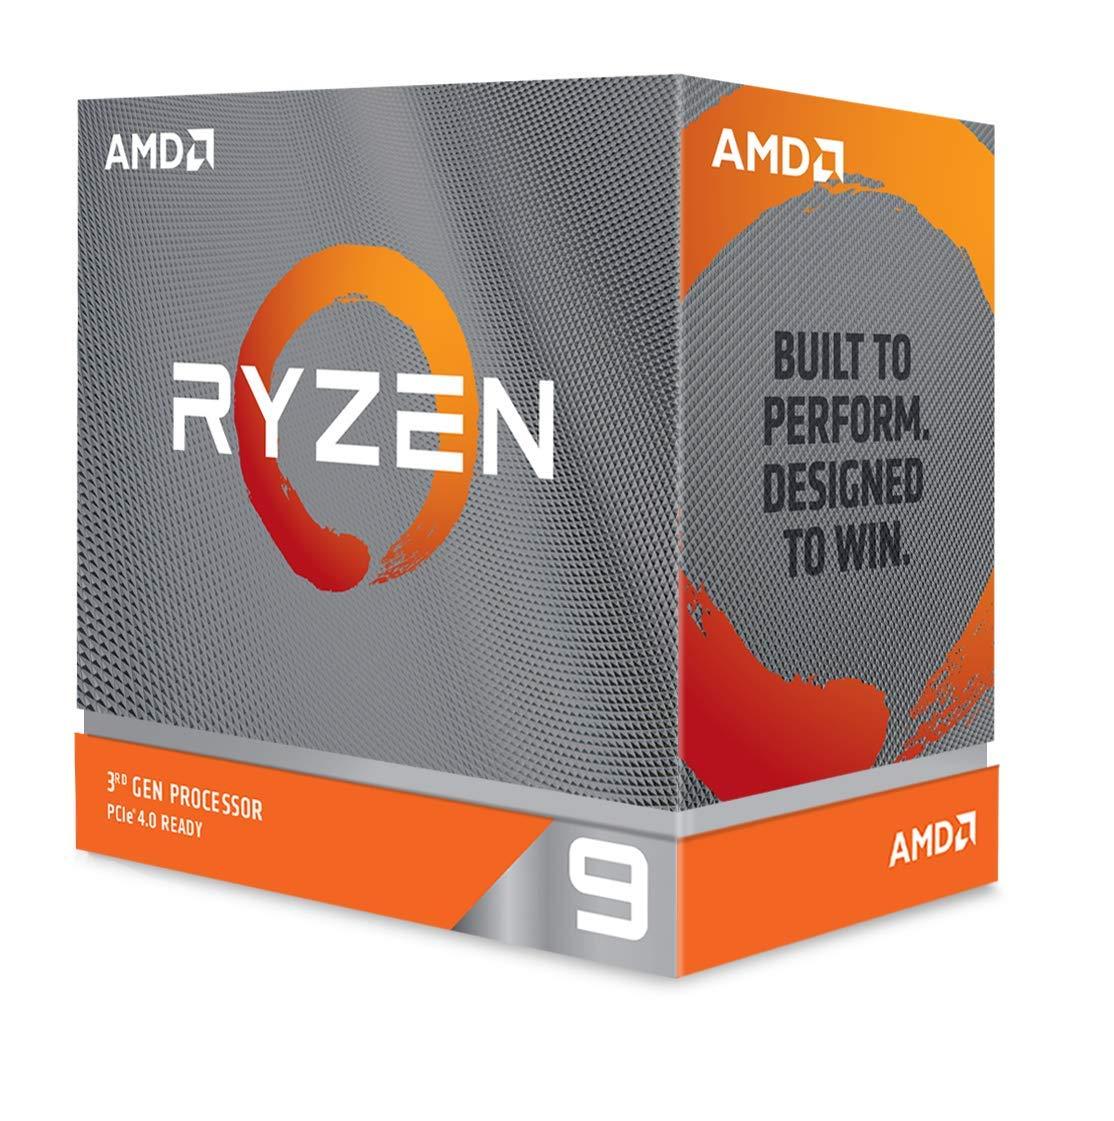 Amd Ryzen 9 3950x - $750 (pre-order) Amazon